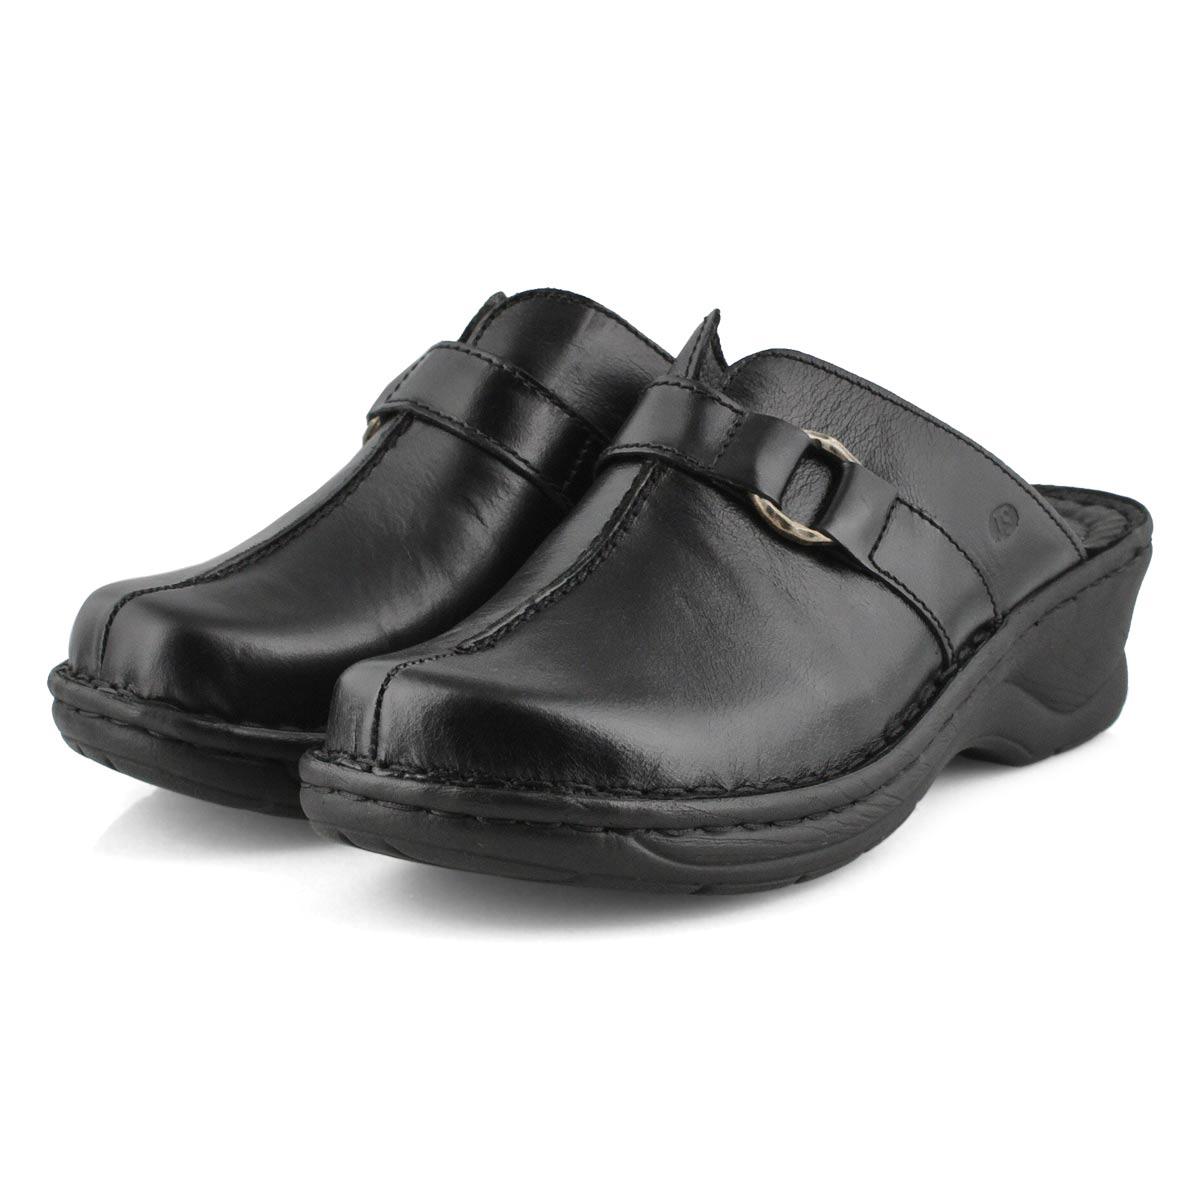 Lds Catalonia 57 black wedge clog